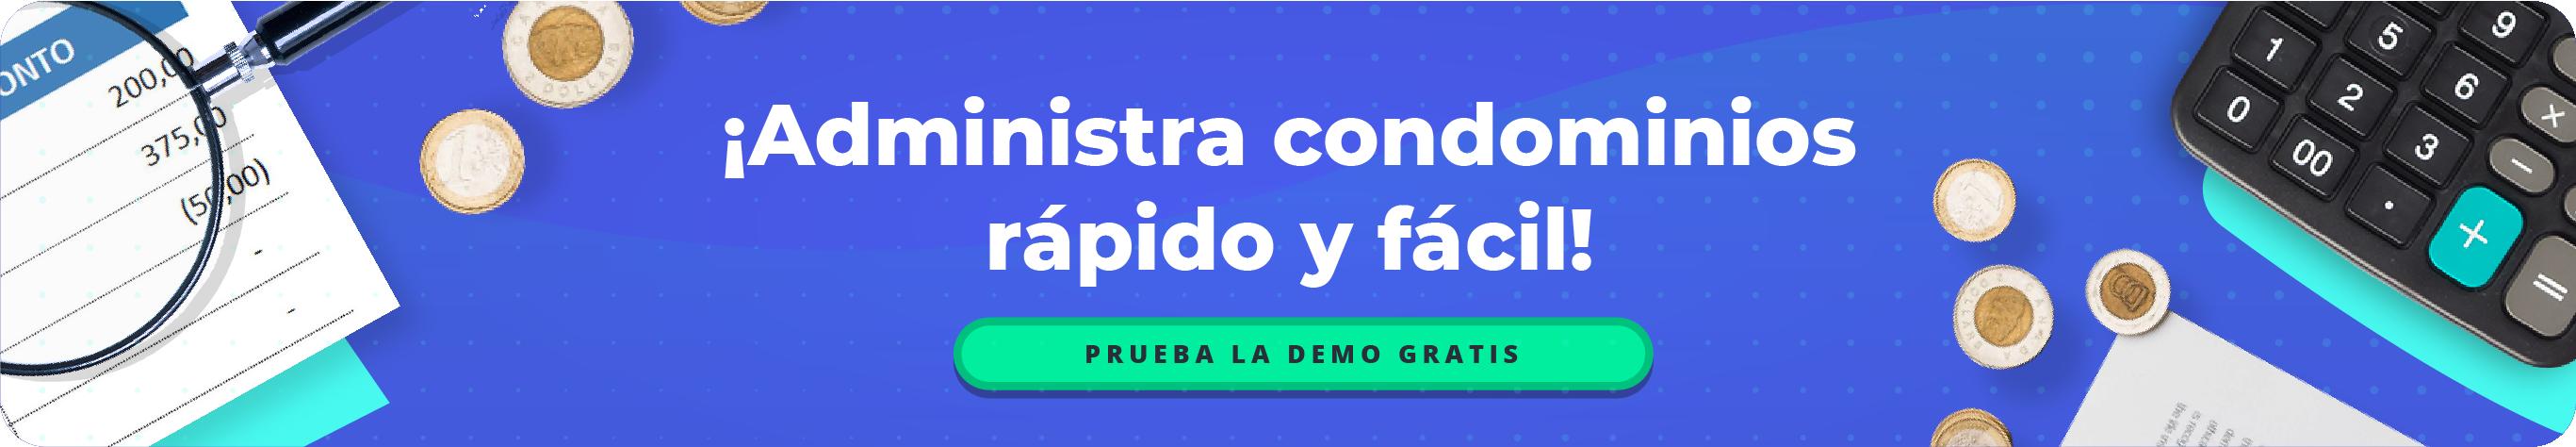 Administra condominios con ComunidadFeliz.cl